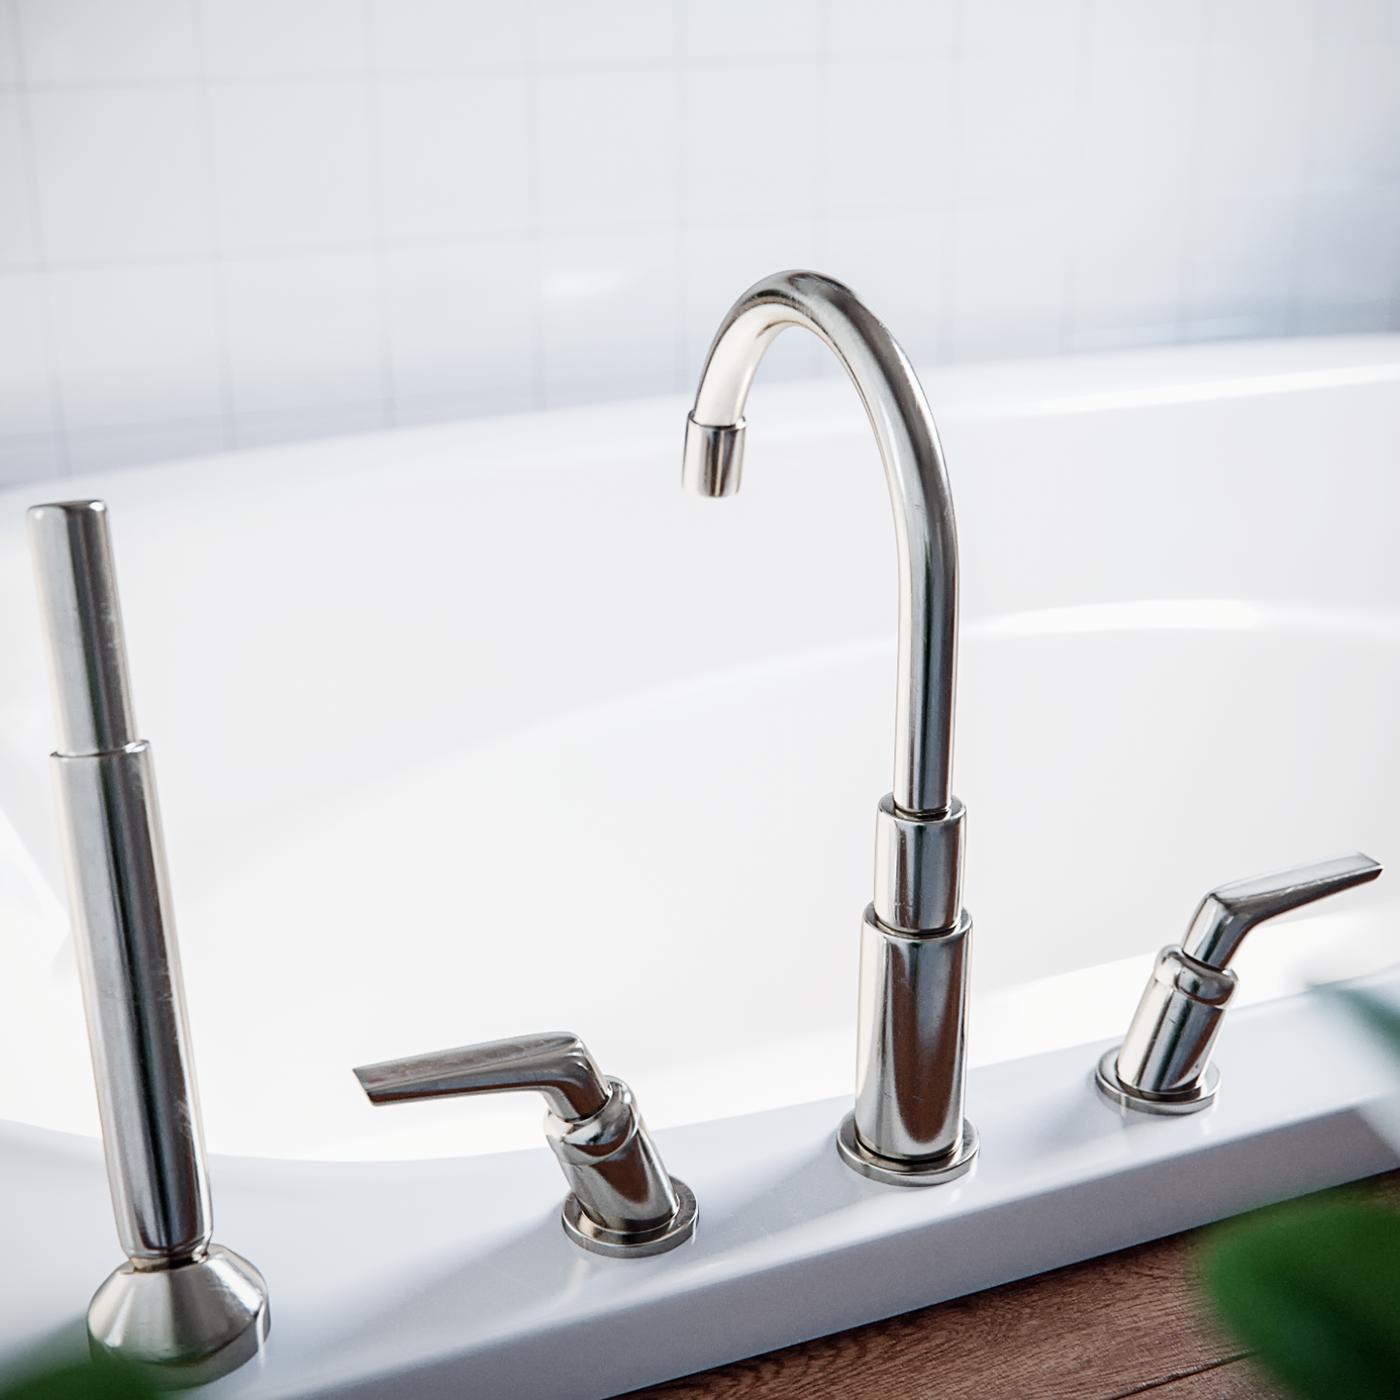 Mini Bathroom Remake On Behance - Bathroom remake